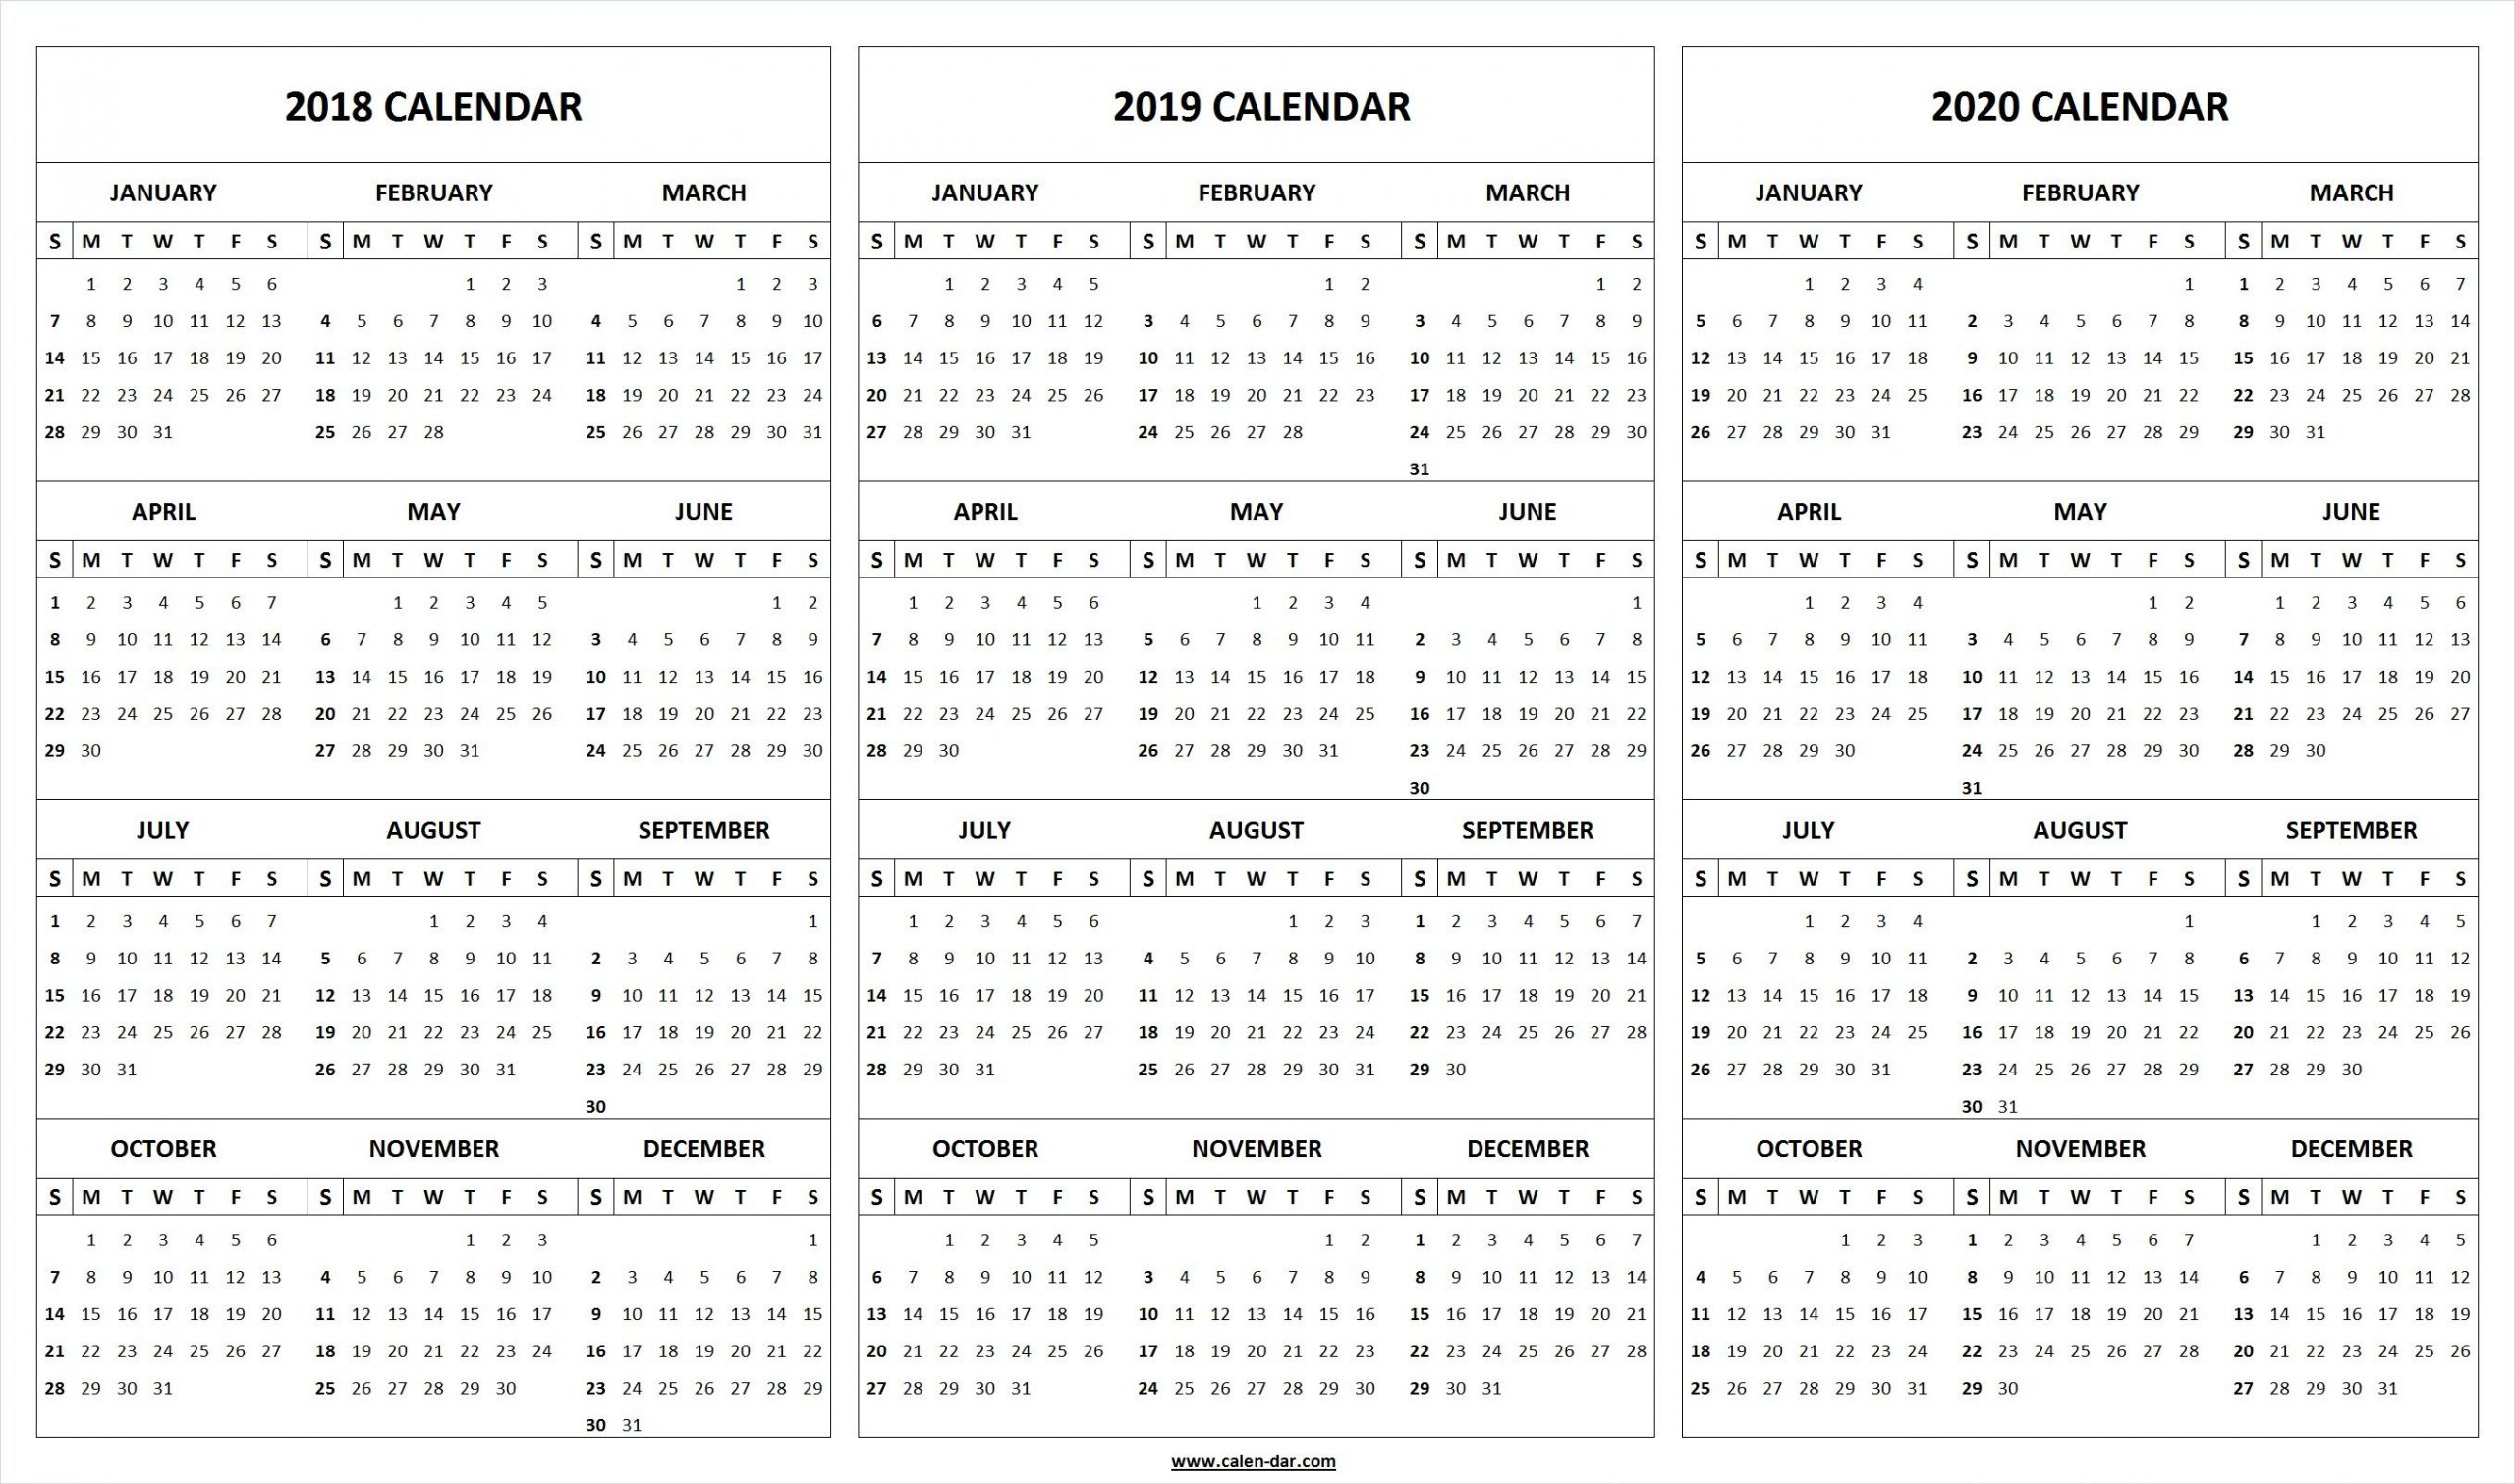 Print Blank 2018 2019 2020 Calendar Template | 2019 Calendar